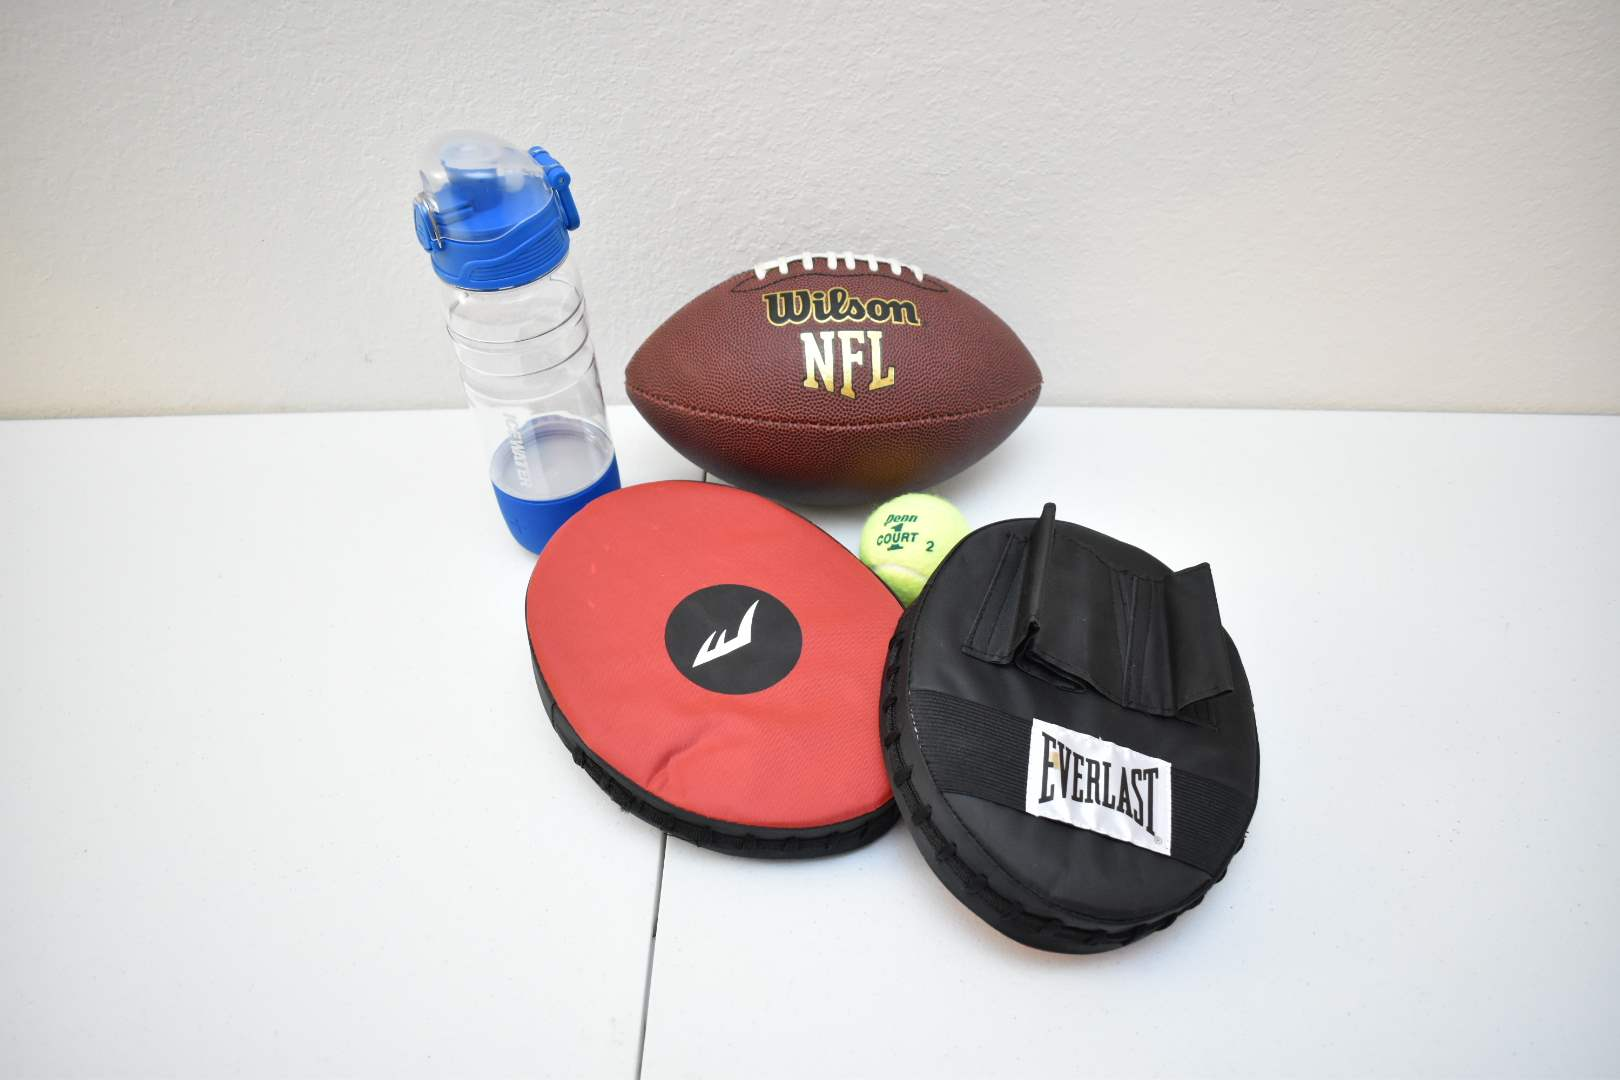 Sporting Items: Water bottle speaker, sparring mitts, football, tennis ball